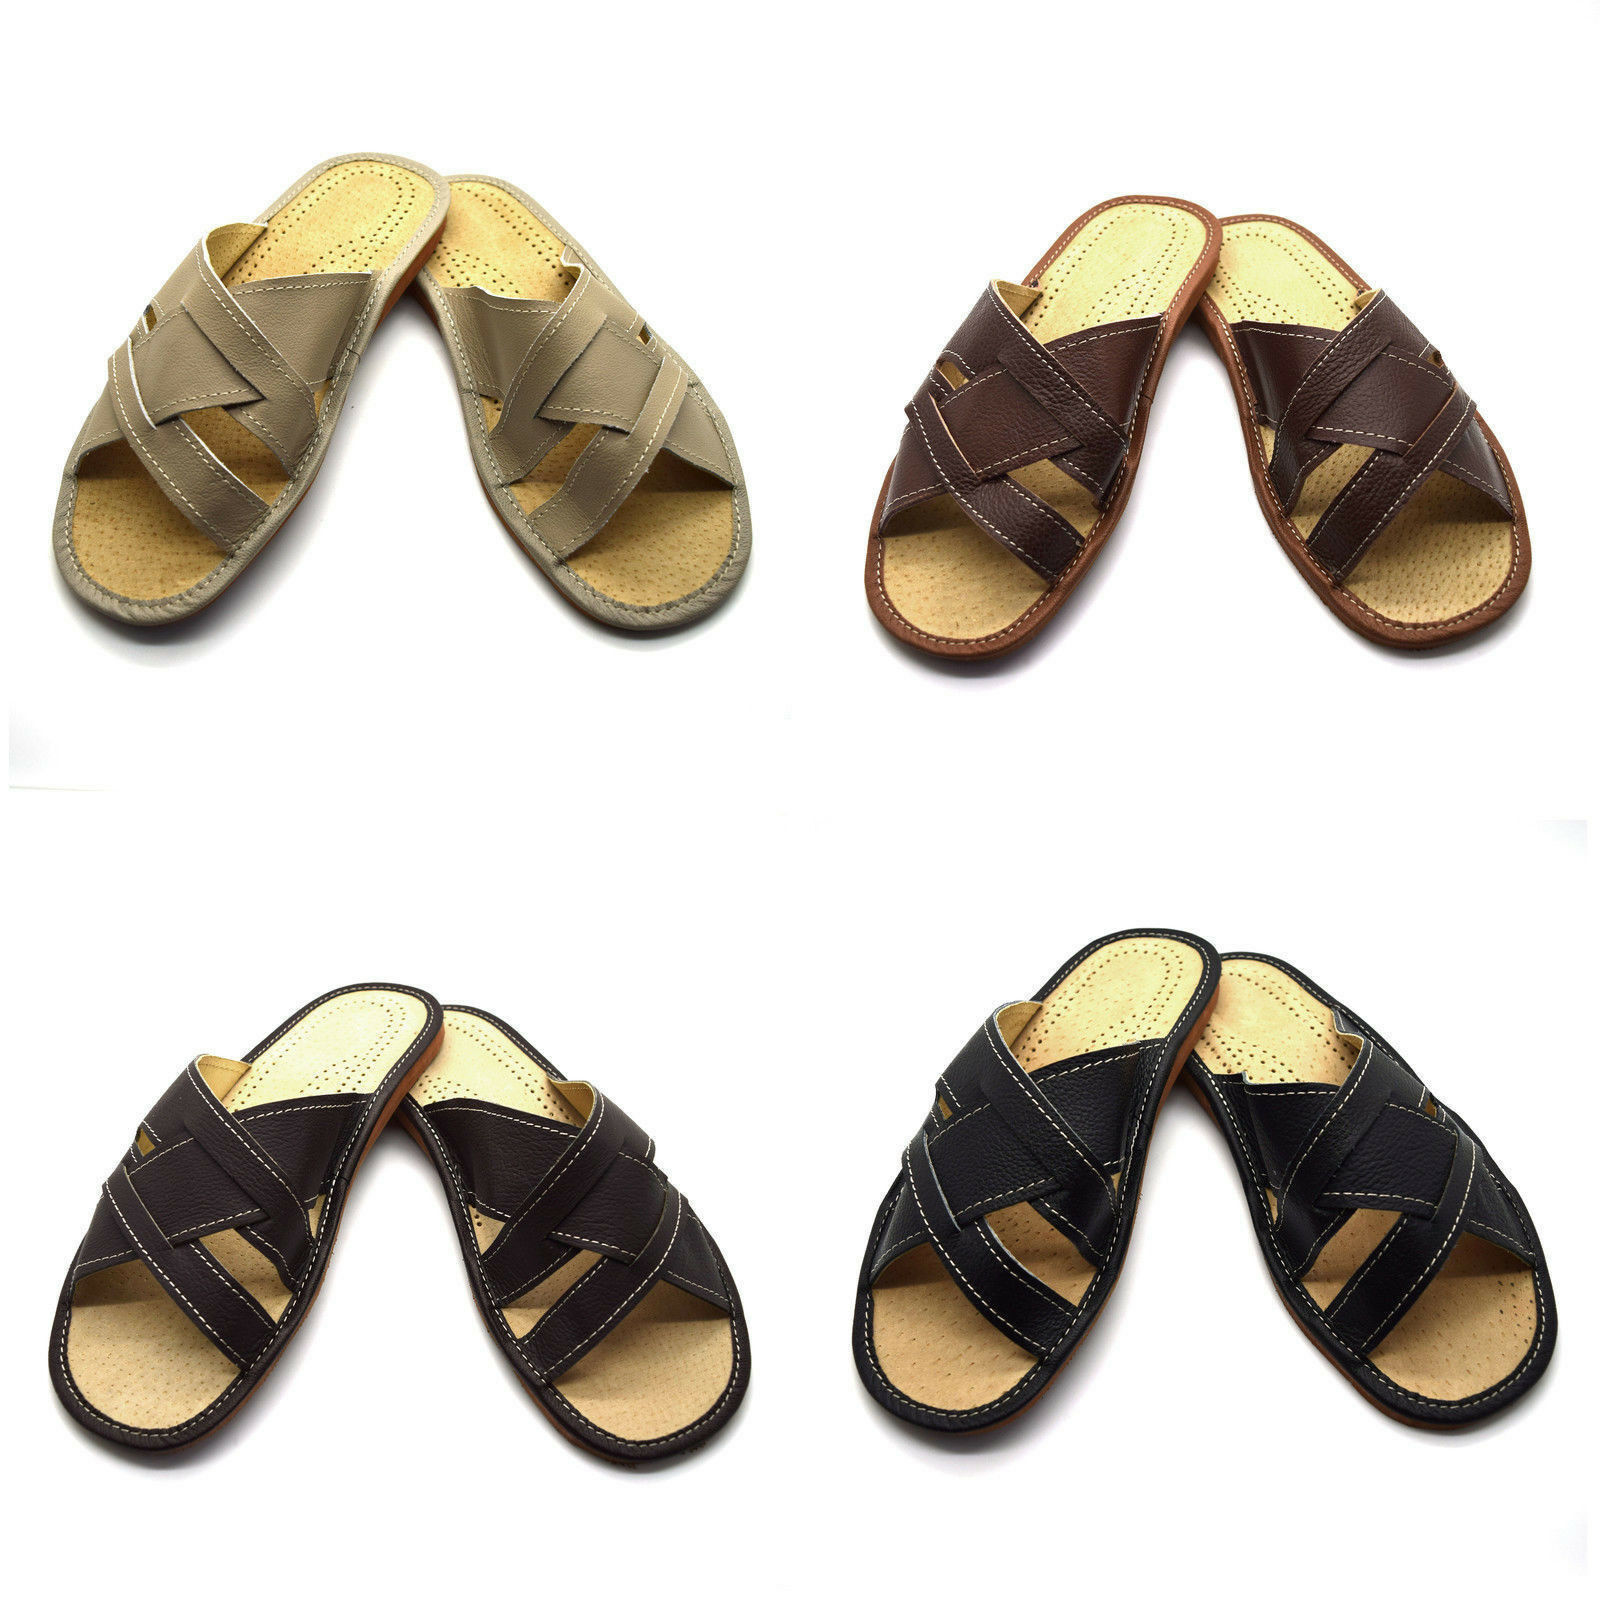 Uomo Gents 100% in Pelle Pantofole Scarpe Sandali INFRAD Brown 6 7 8 9 10 11 12